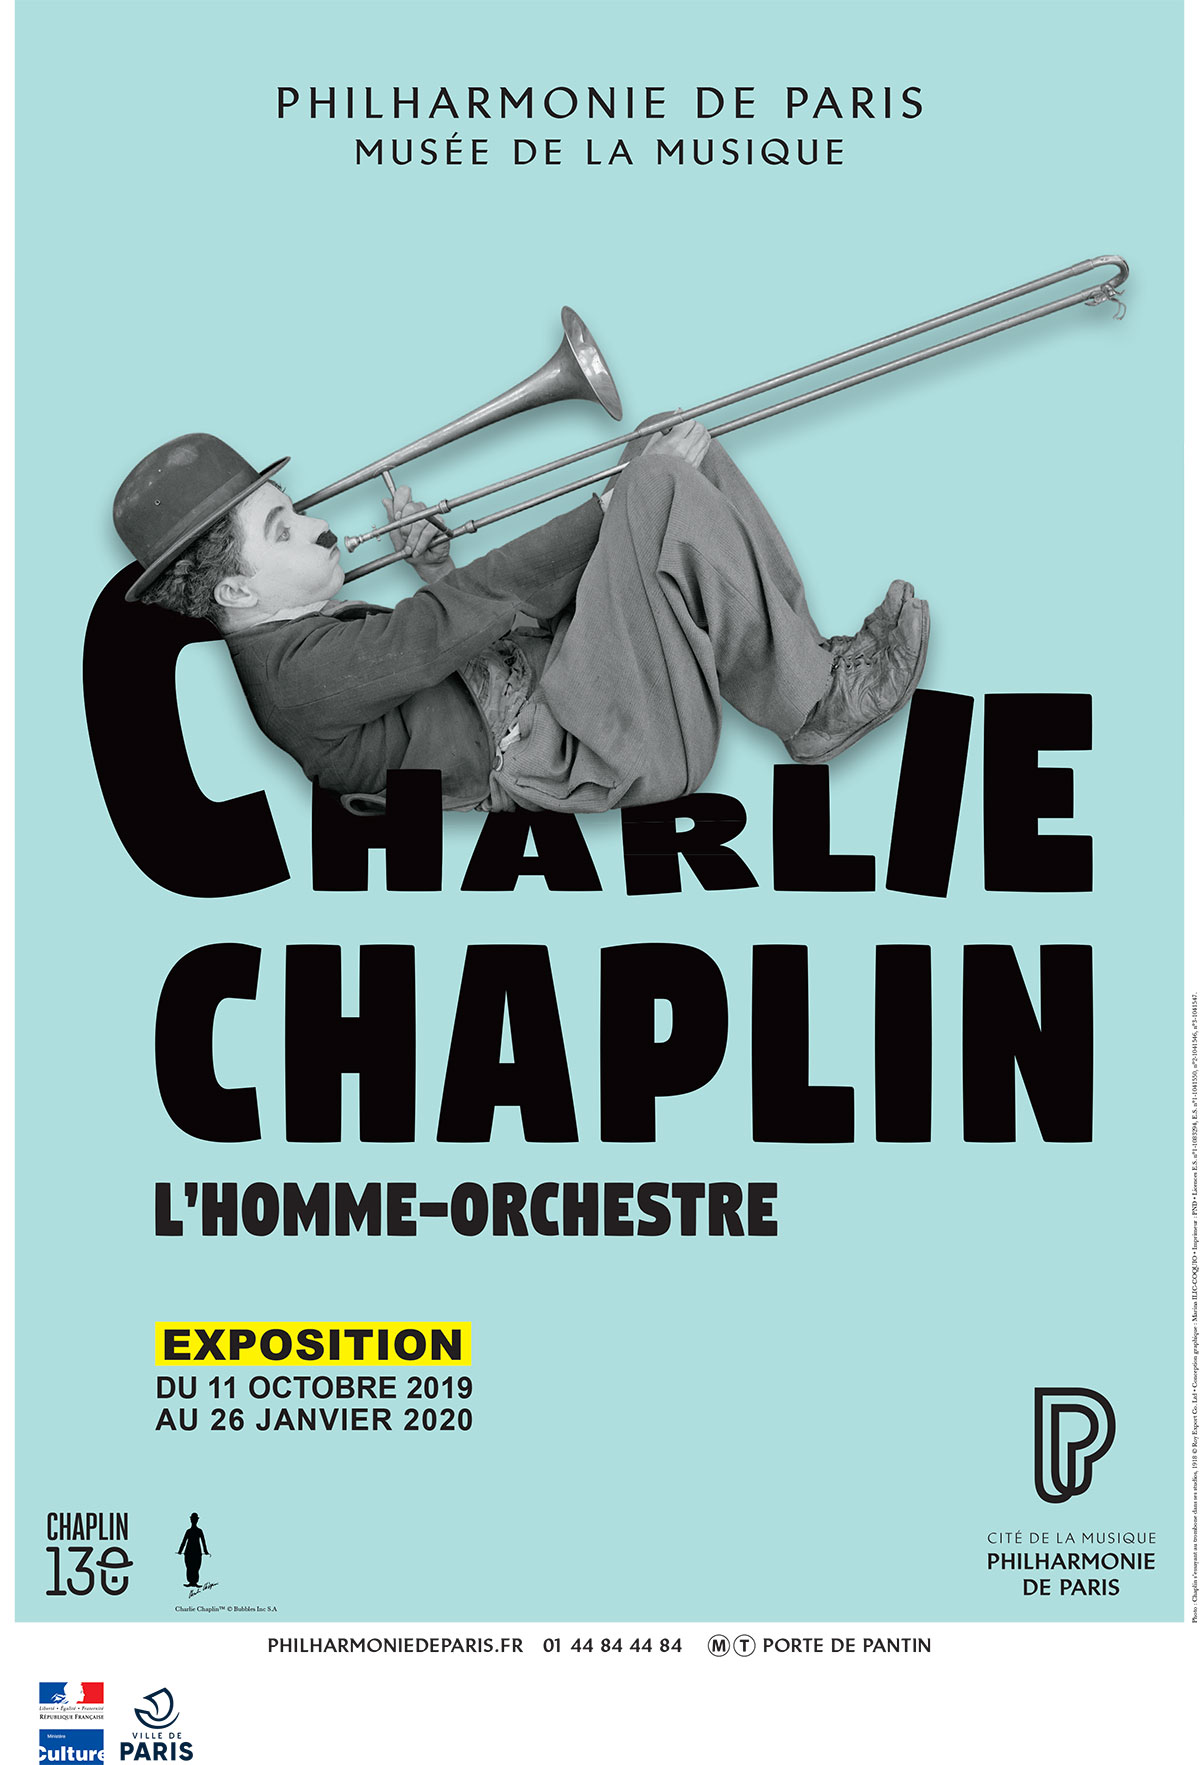 chaplin-philharmonie-1200-web